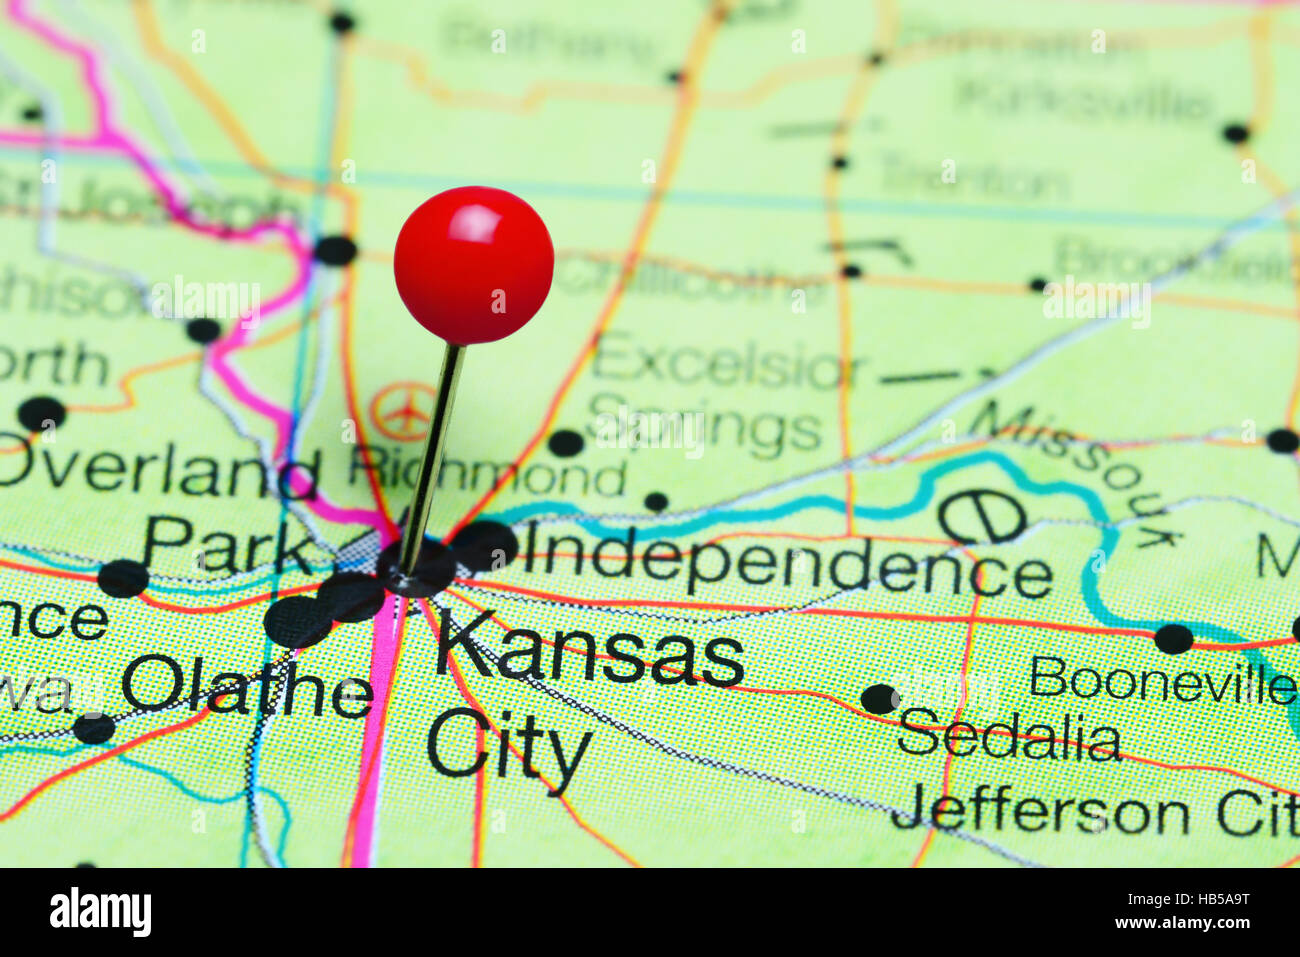 Kansas city, missouri (informally abbreviated kc) is the largest city in the u.s. Kansas City Pinned On A Map Of Missouri Usa Stock Photo Alamy